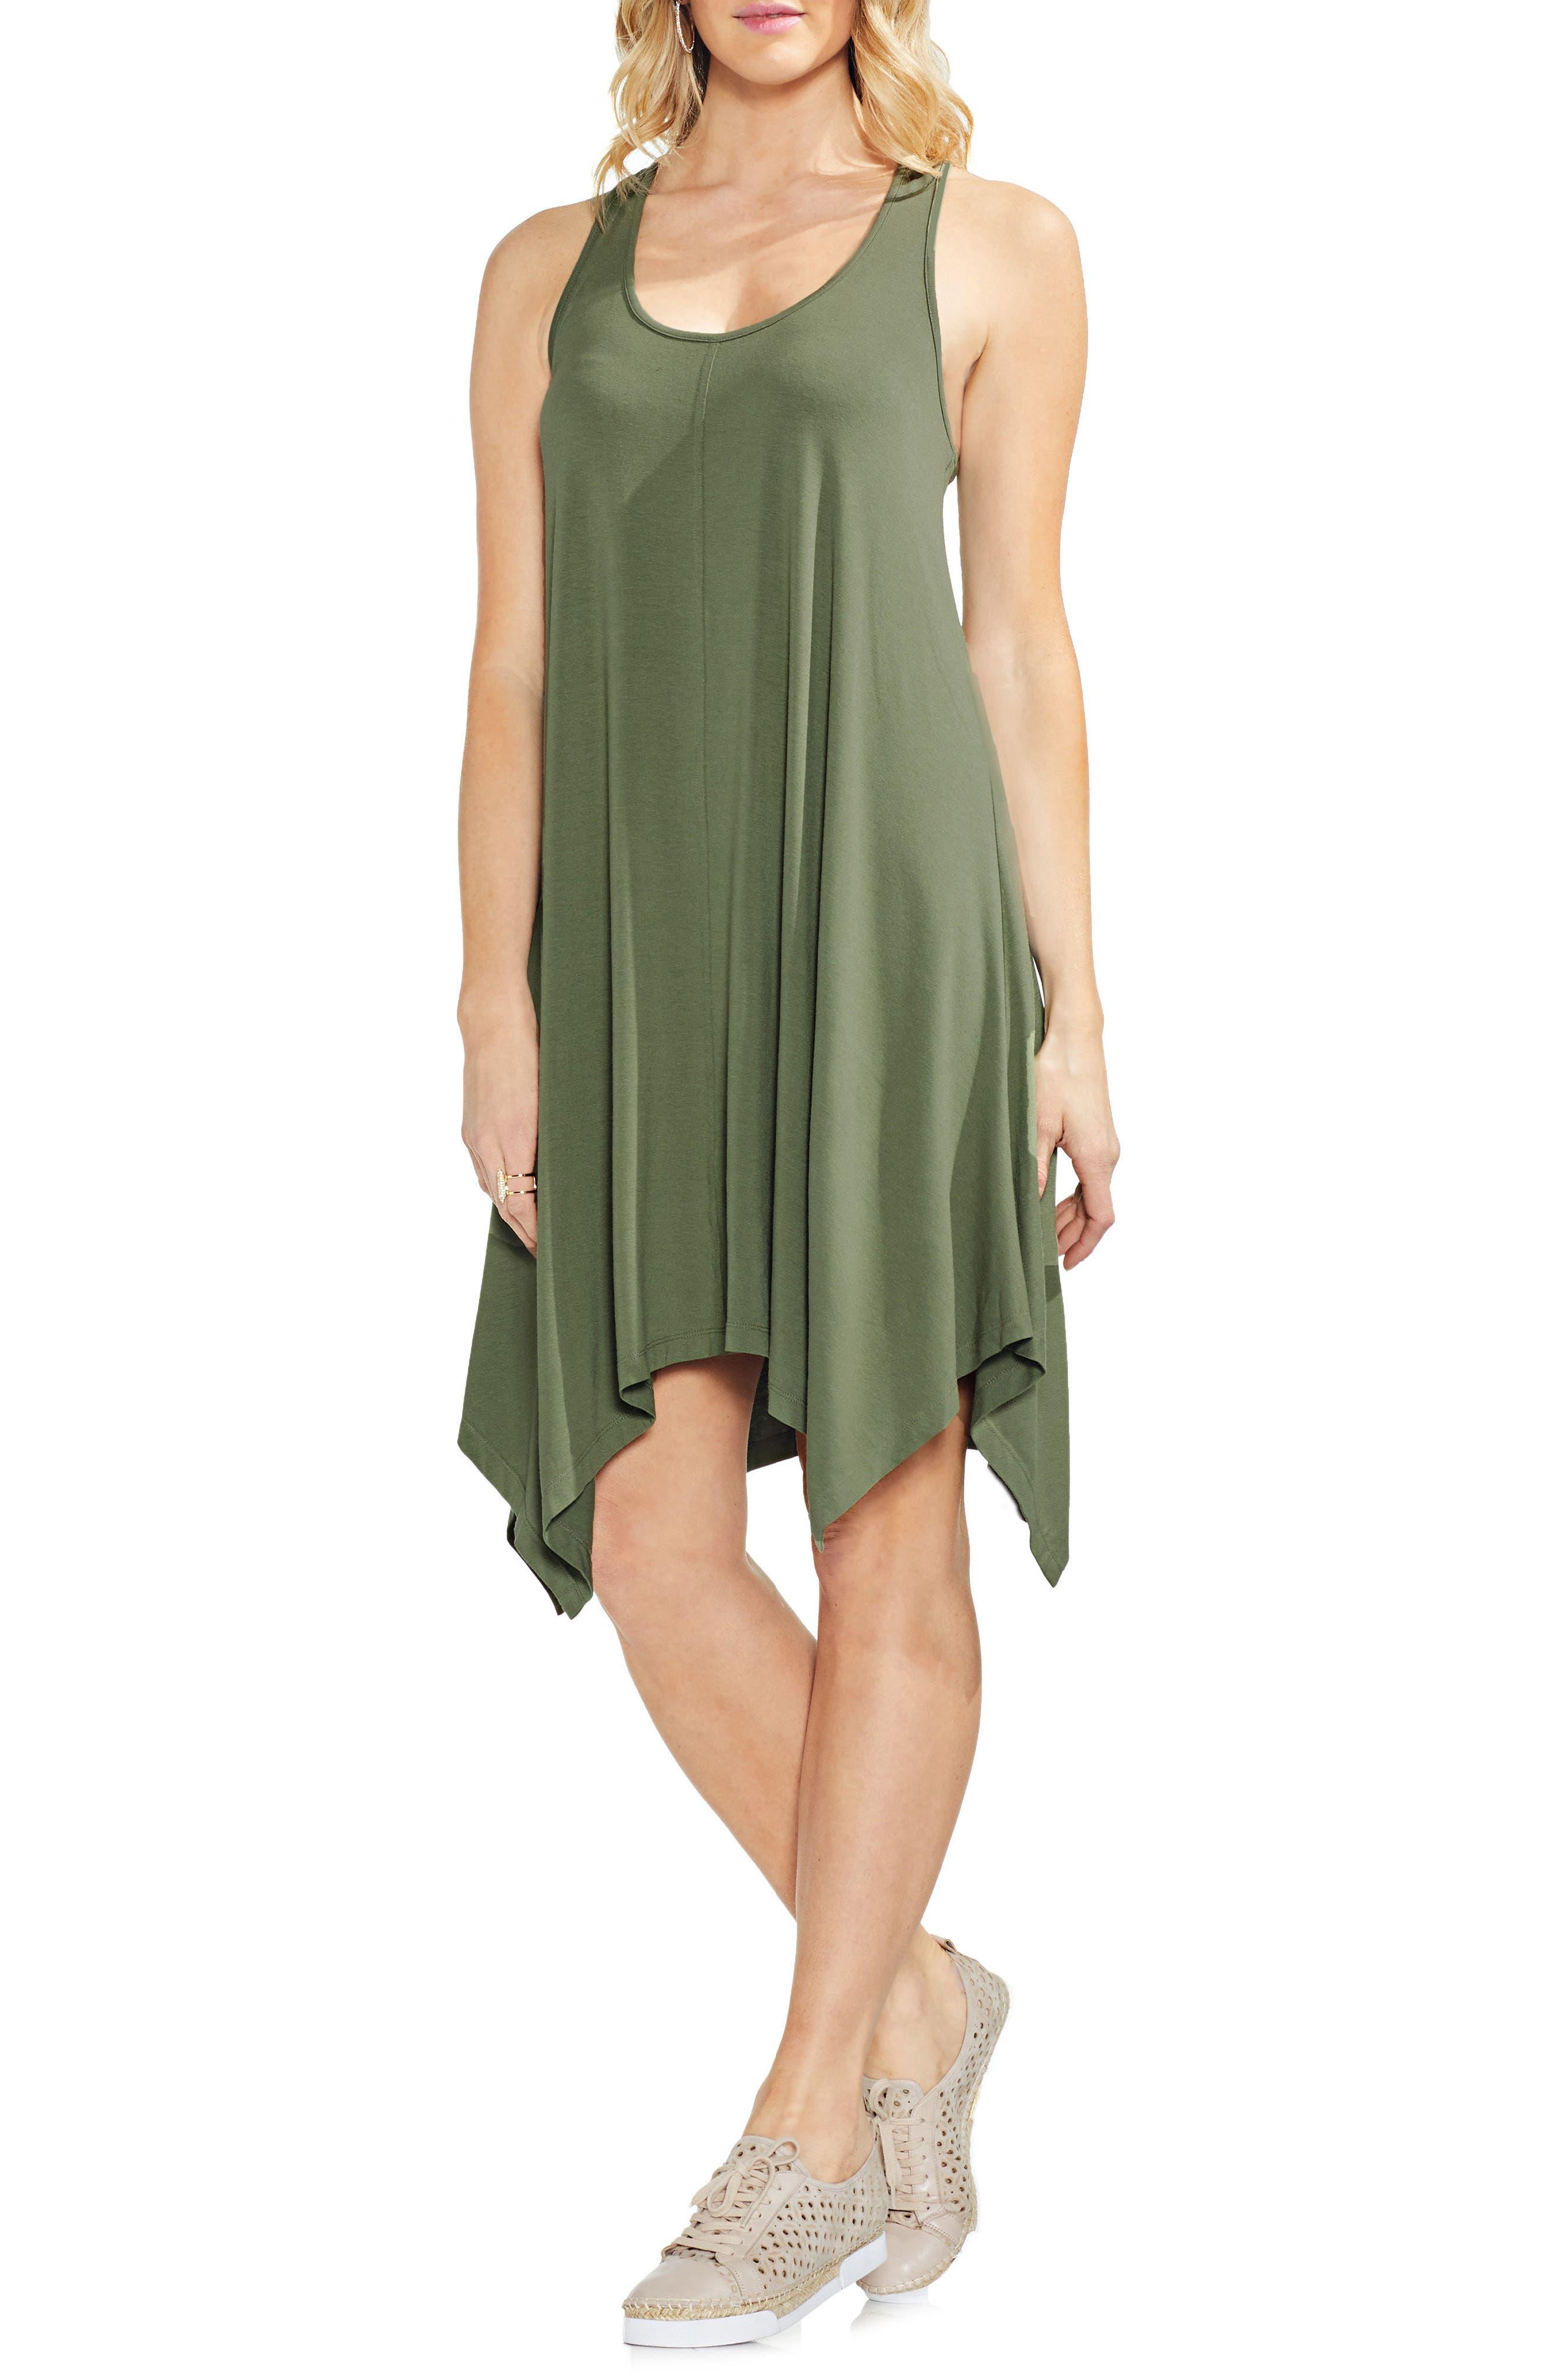 VINCE CAMUTO,                             Handkerchief Hem Tank Dress,                             Main thumbnail 1, color,                             300